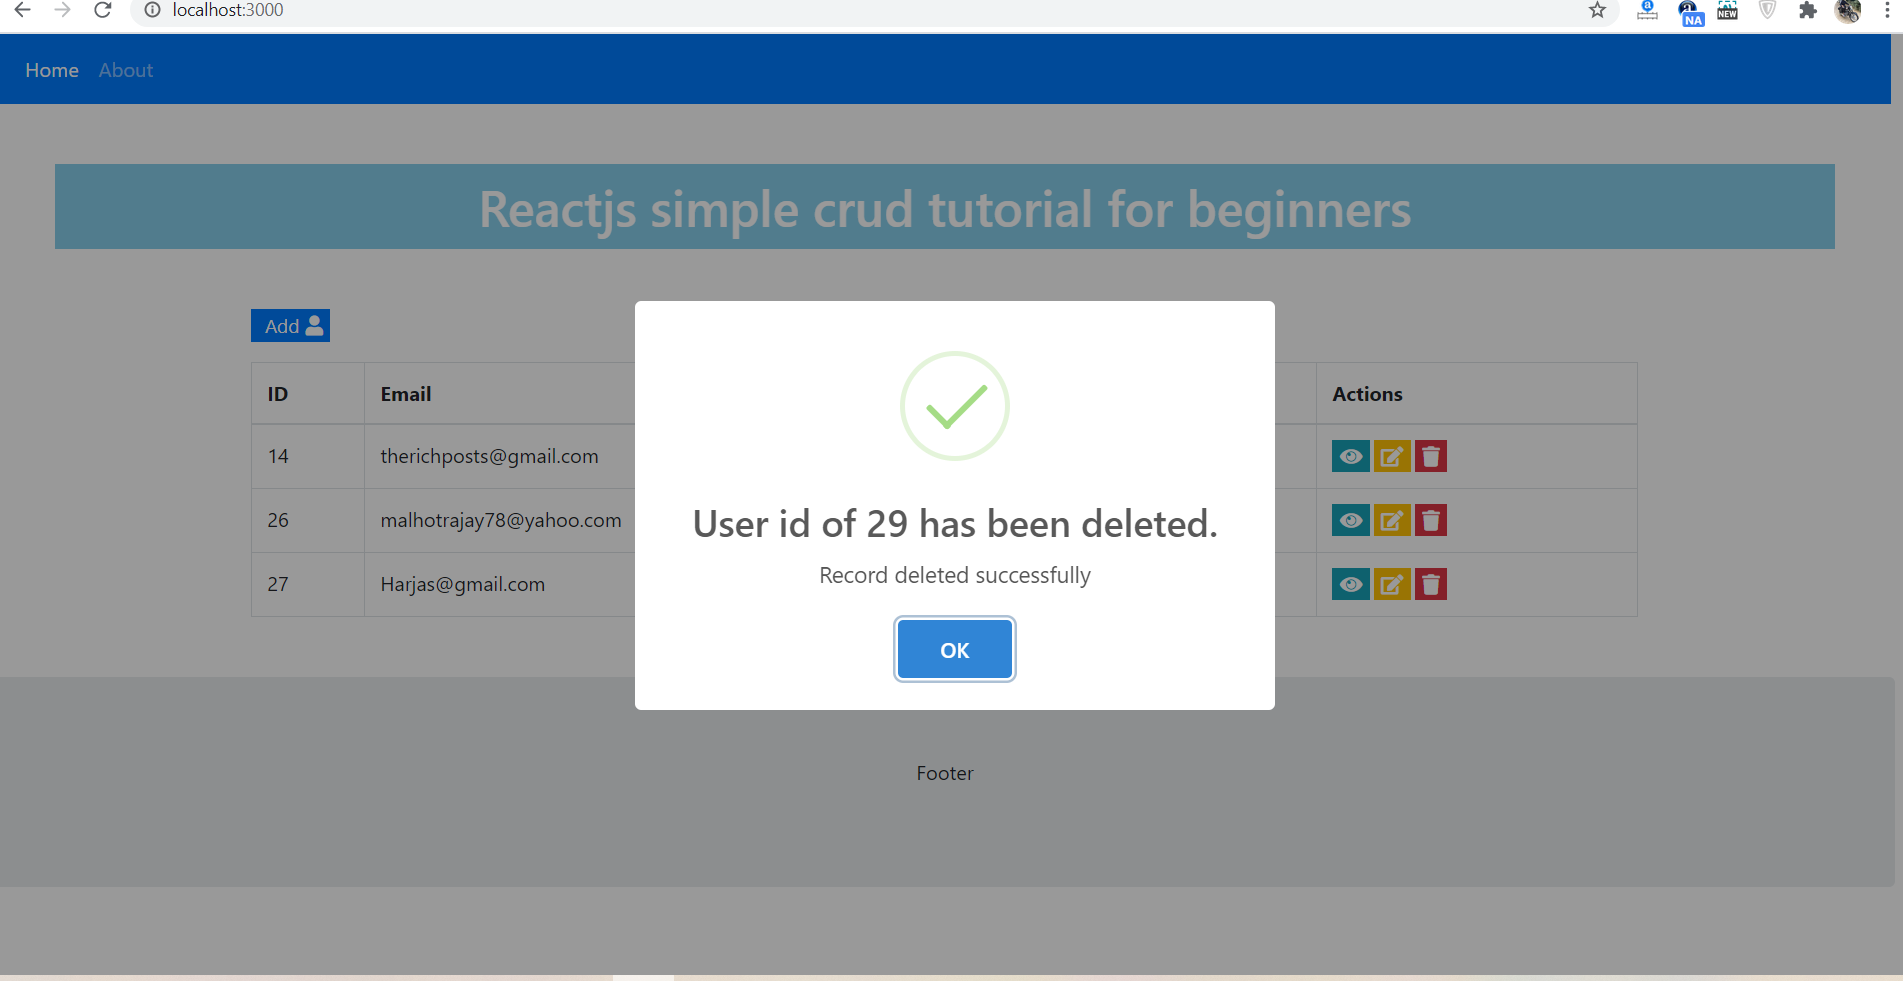 Reactjs Crud Tutorial - Delete User